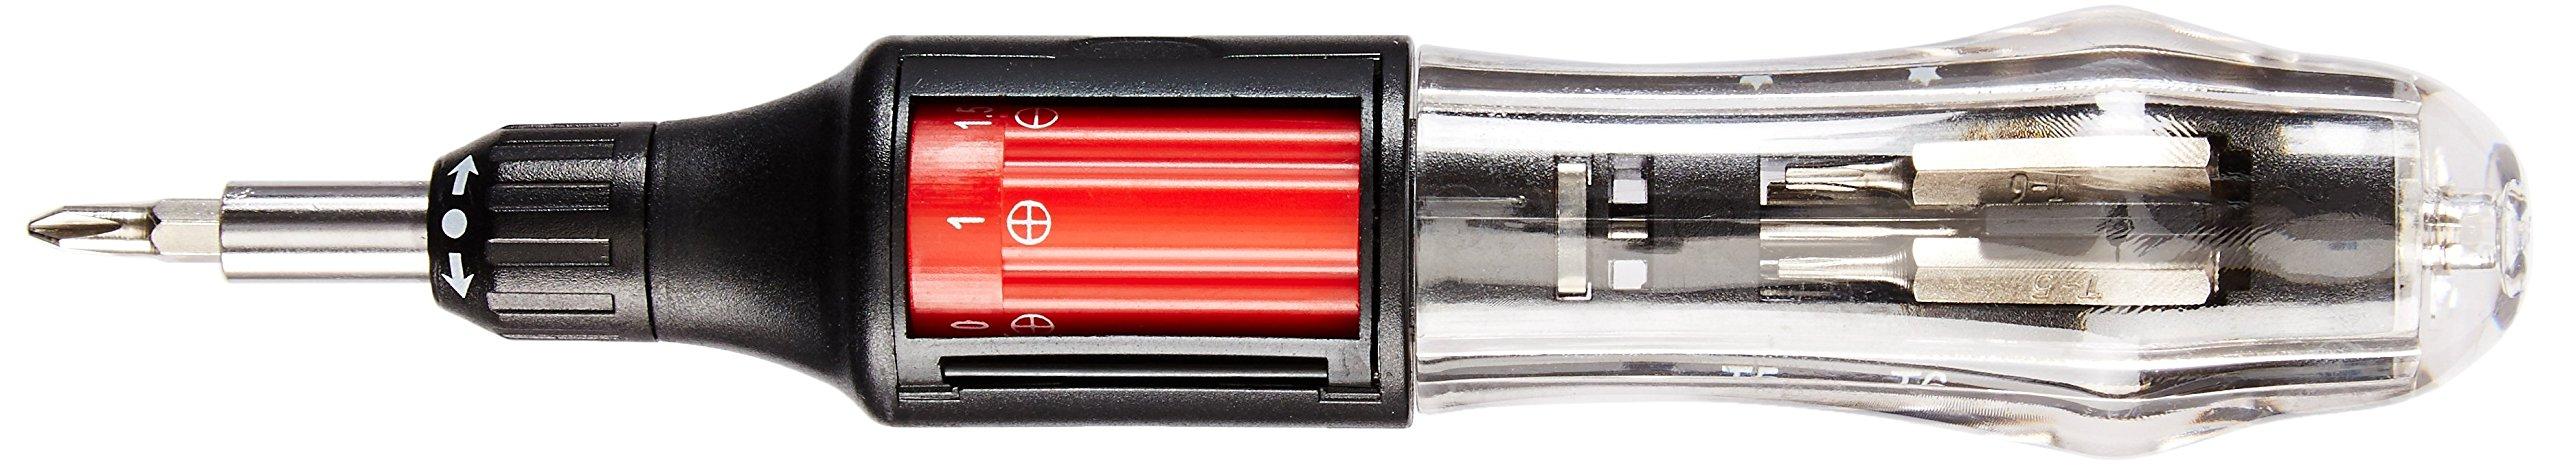 Neiko 01336A 10 in 1 Autoloading Heavy Duty Precision Screwdriver   Phillips, Flathead, Star   3-Way Gearless Ratchet